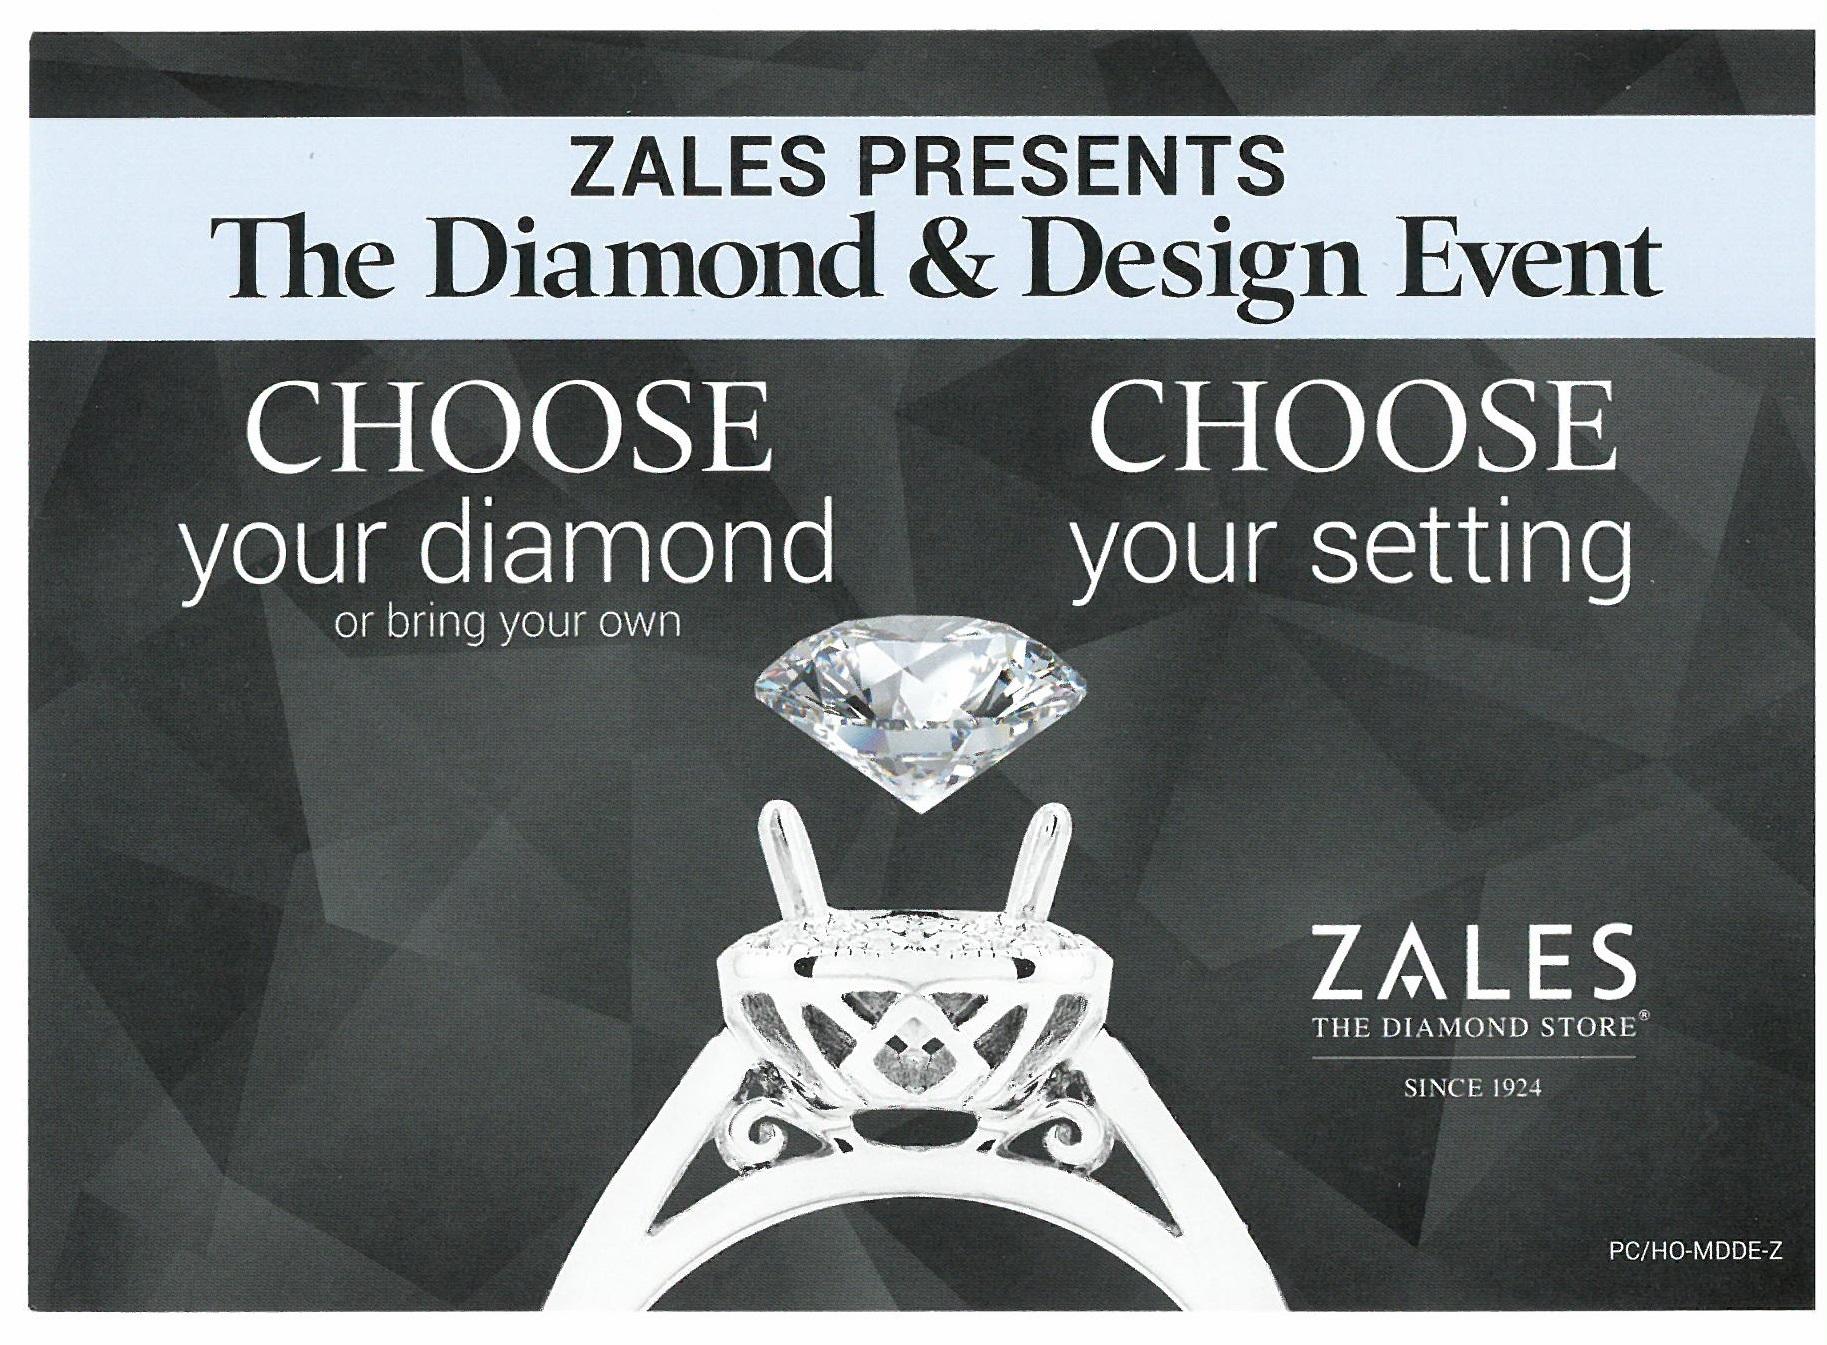 Zales Diamond Design Event Poughkeepsie Galleria